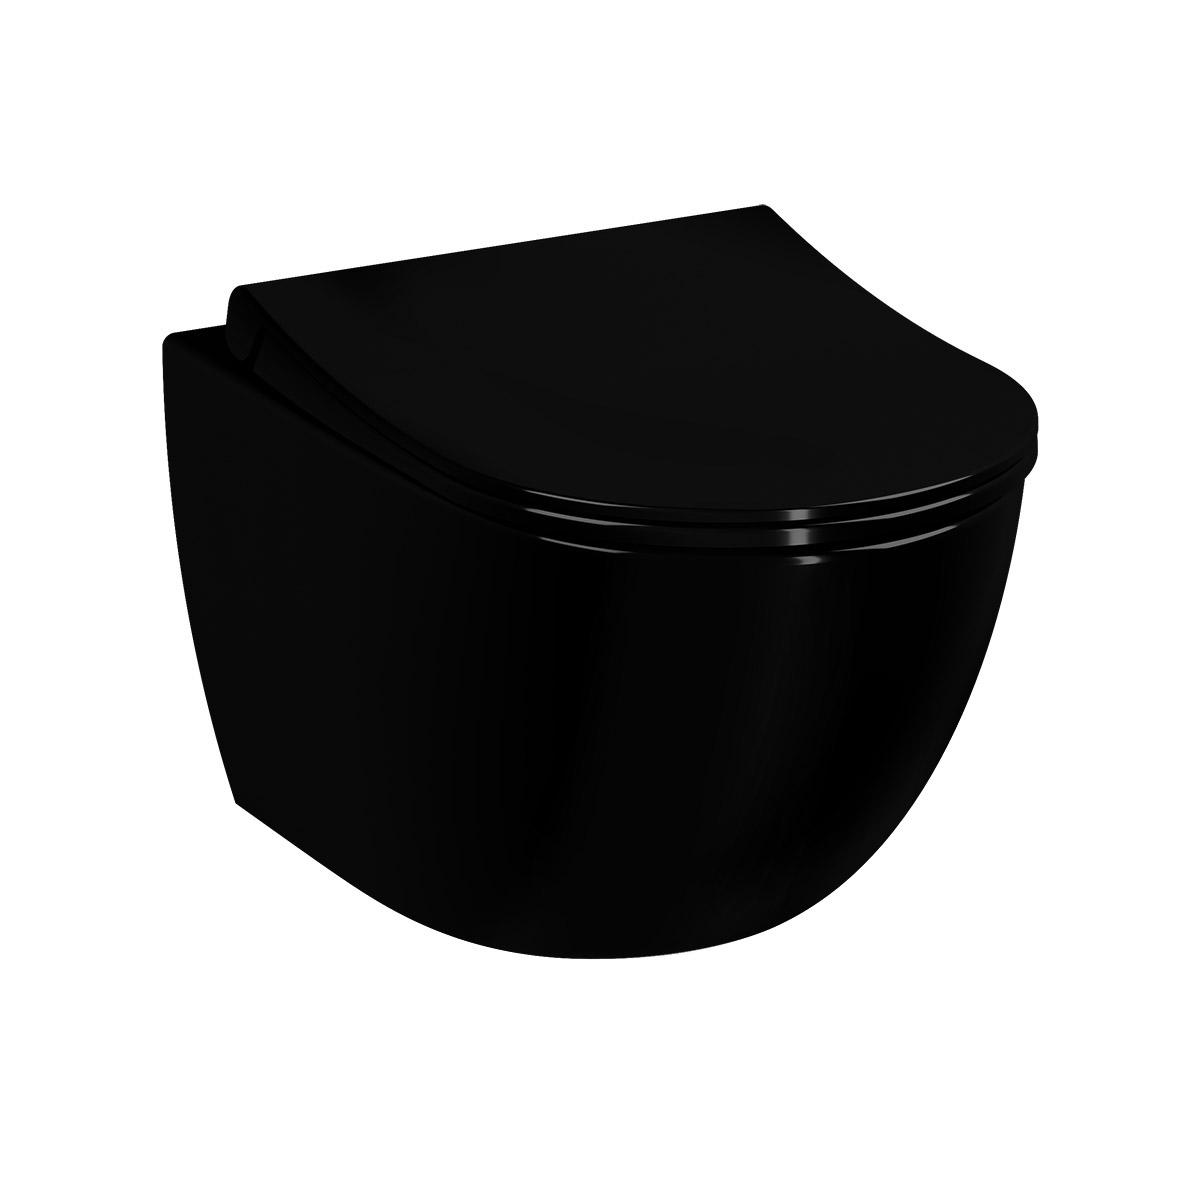 Sento Wand-WC VitrA Flush 2.0 mit Bidetfunktion, Schwarz Hochglanz